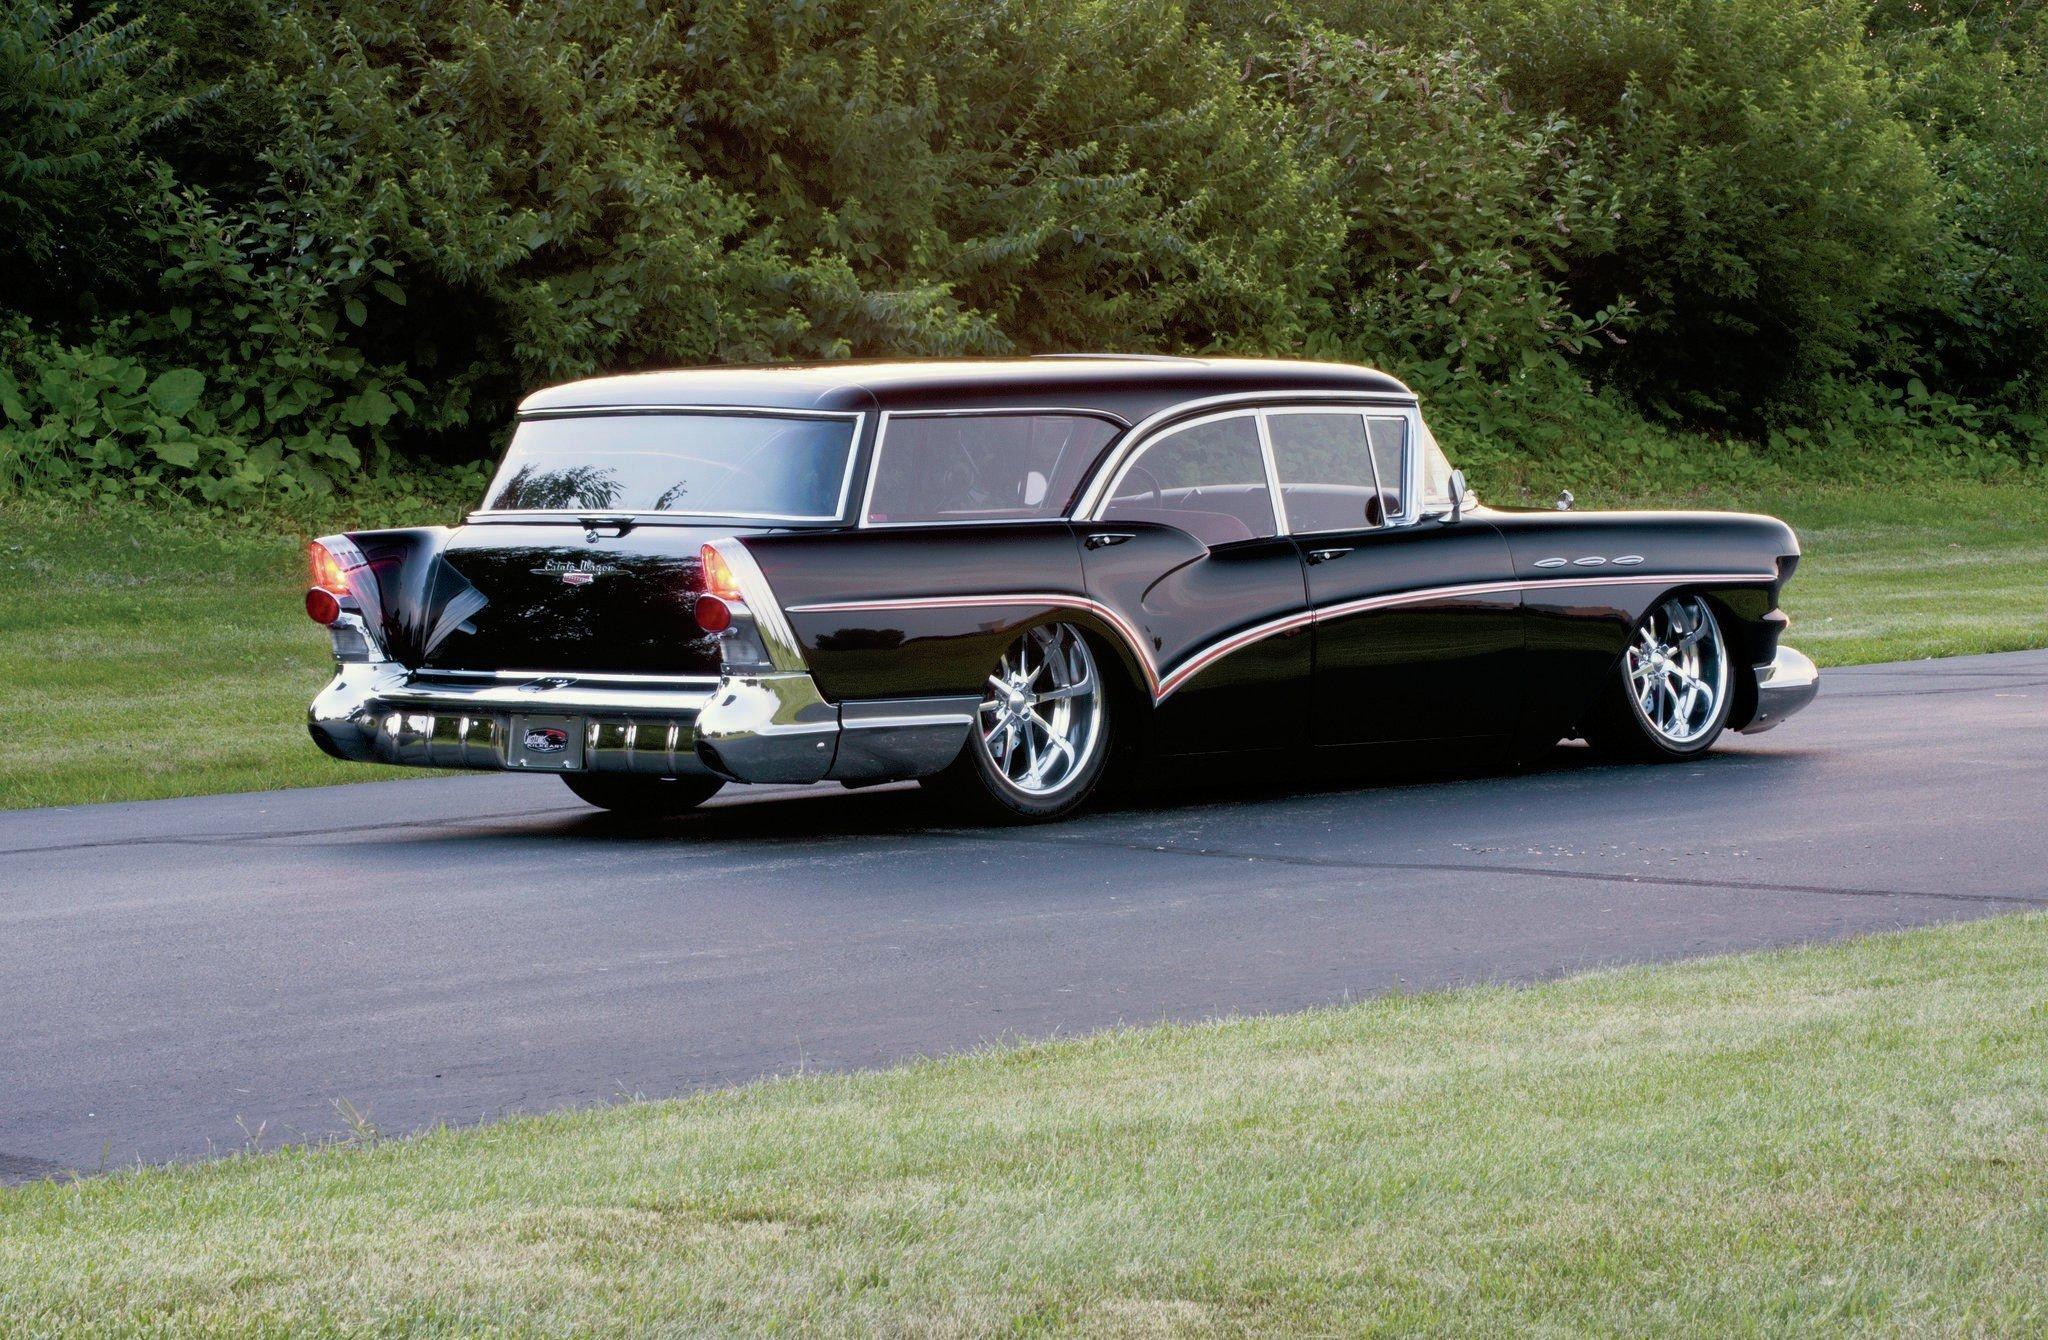 1957 Buick Caballero Station Wagon 02 Wallpaper 0x0 613734 Wallpaperup